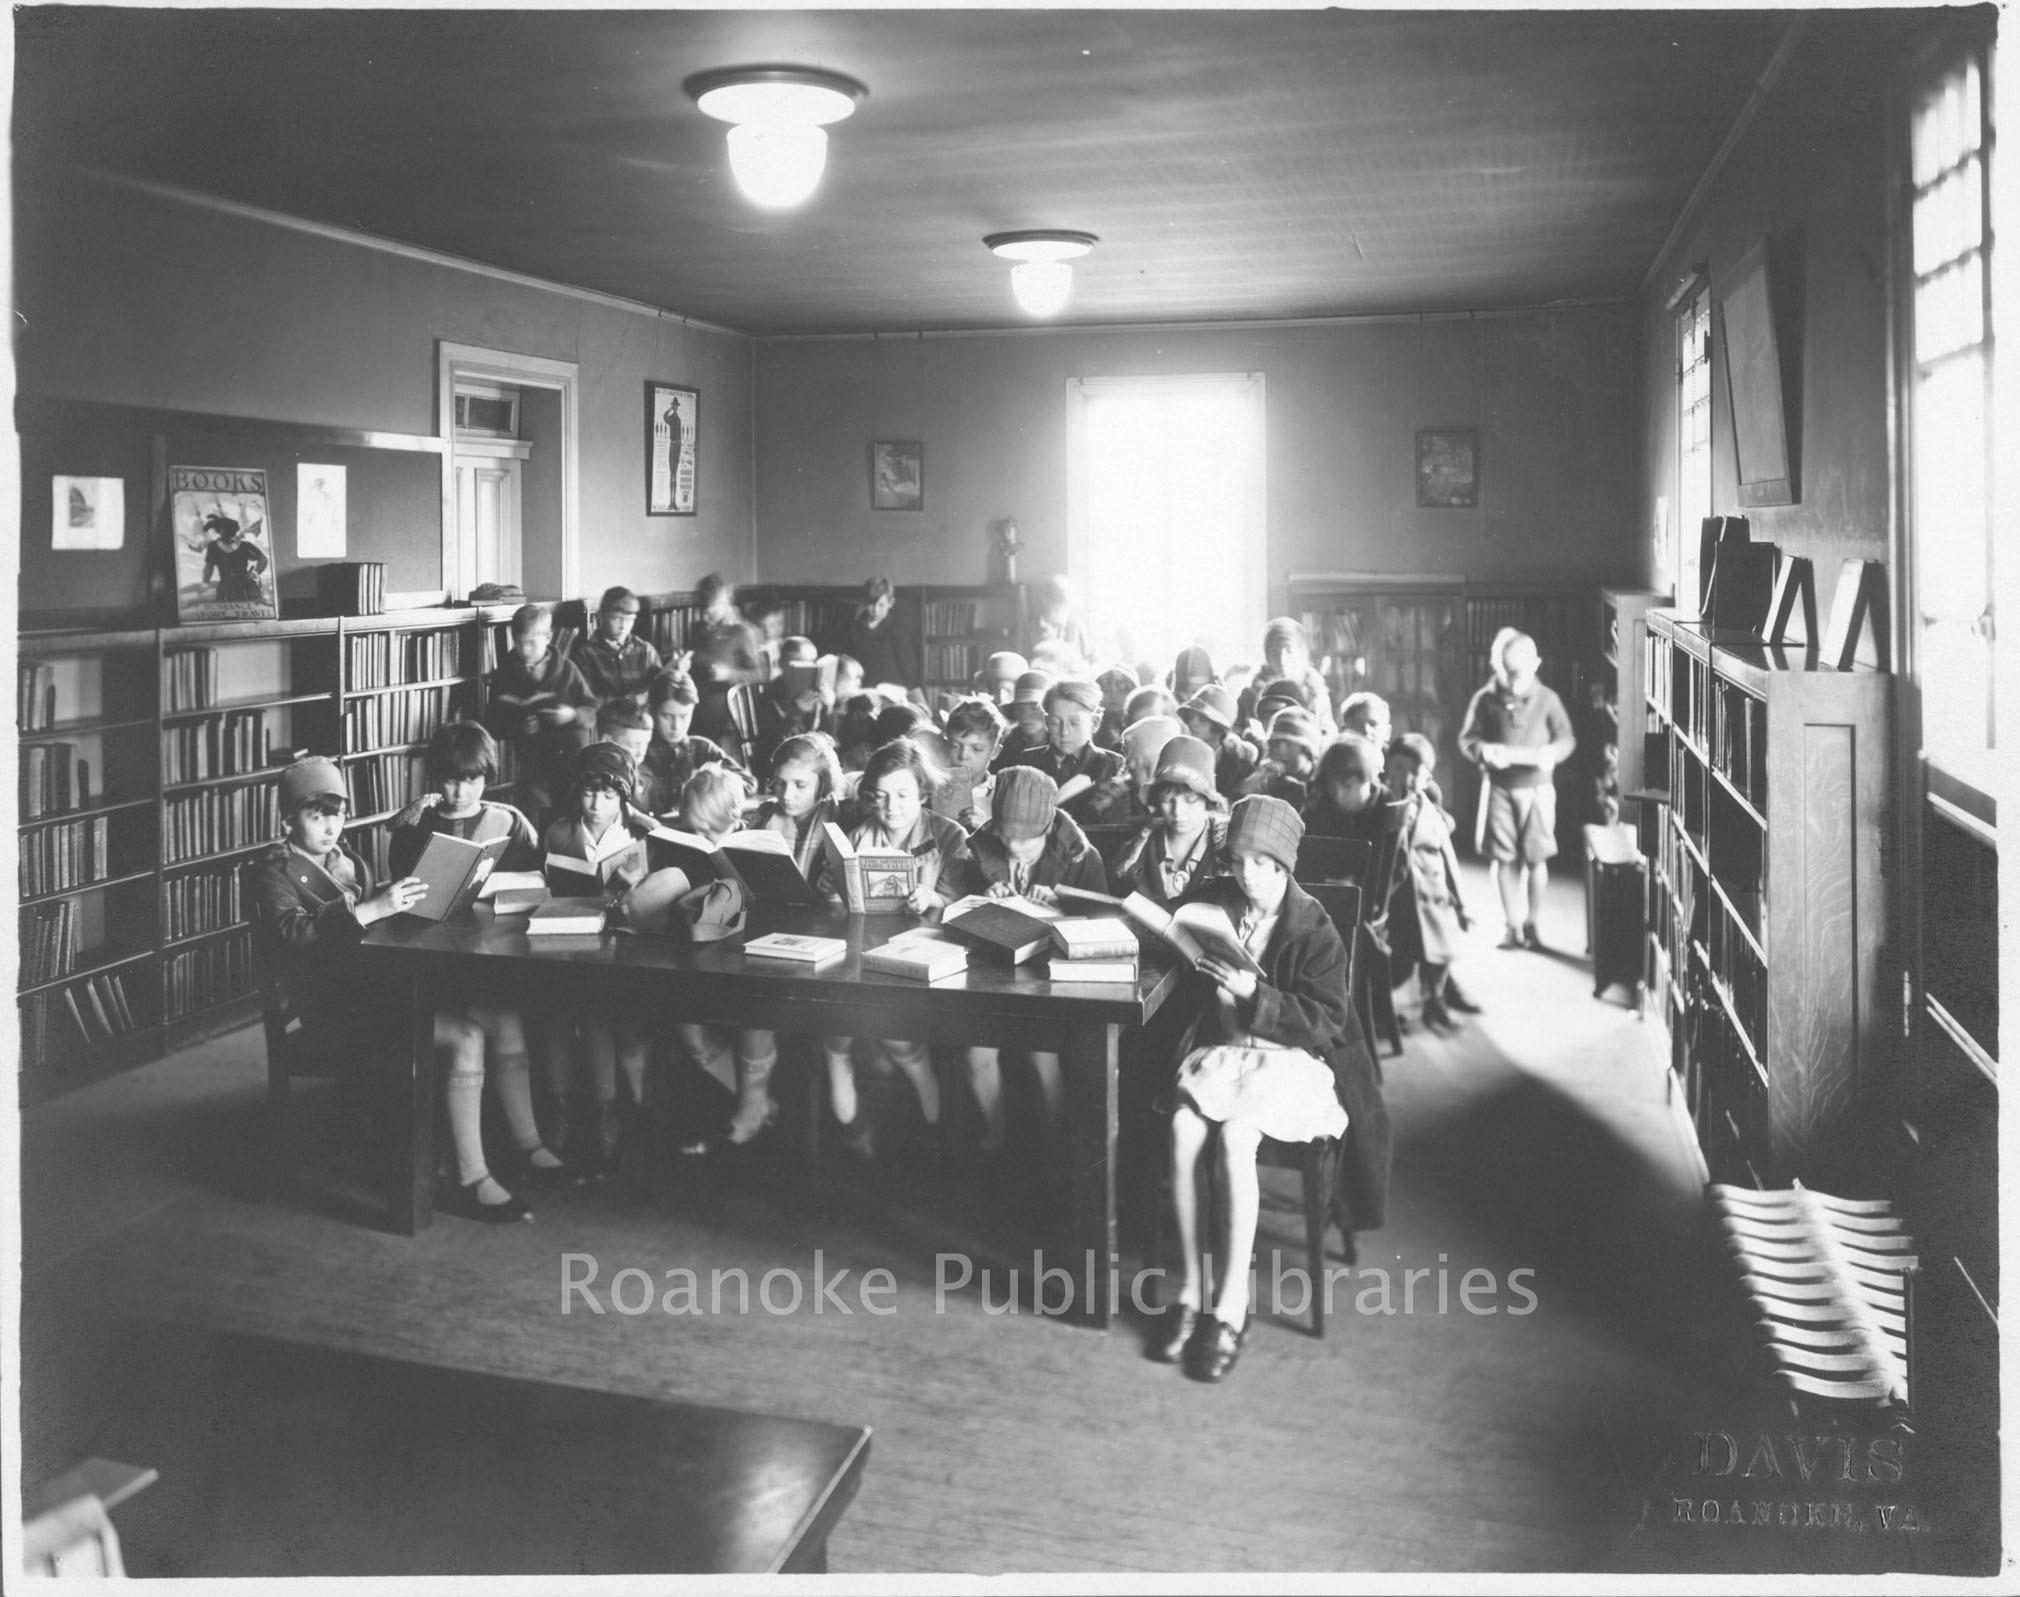 Davis 15.211 Storytime at Roanoke Public Libraries.jpg